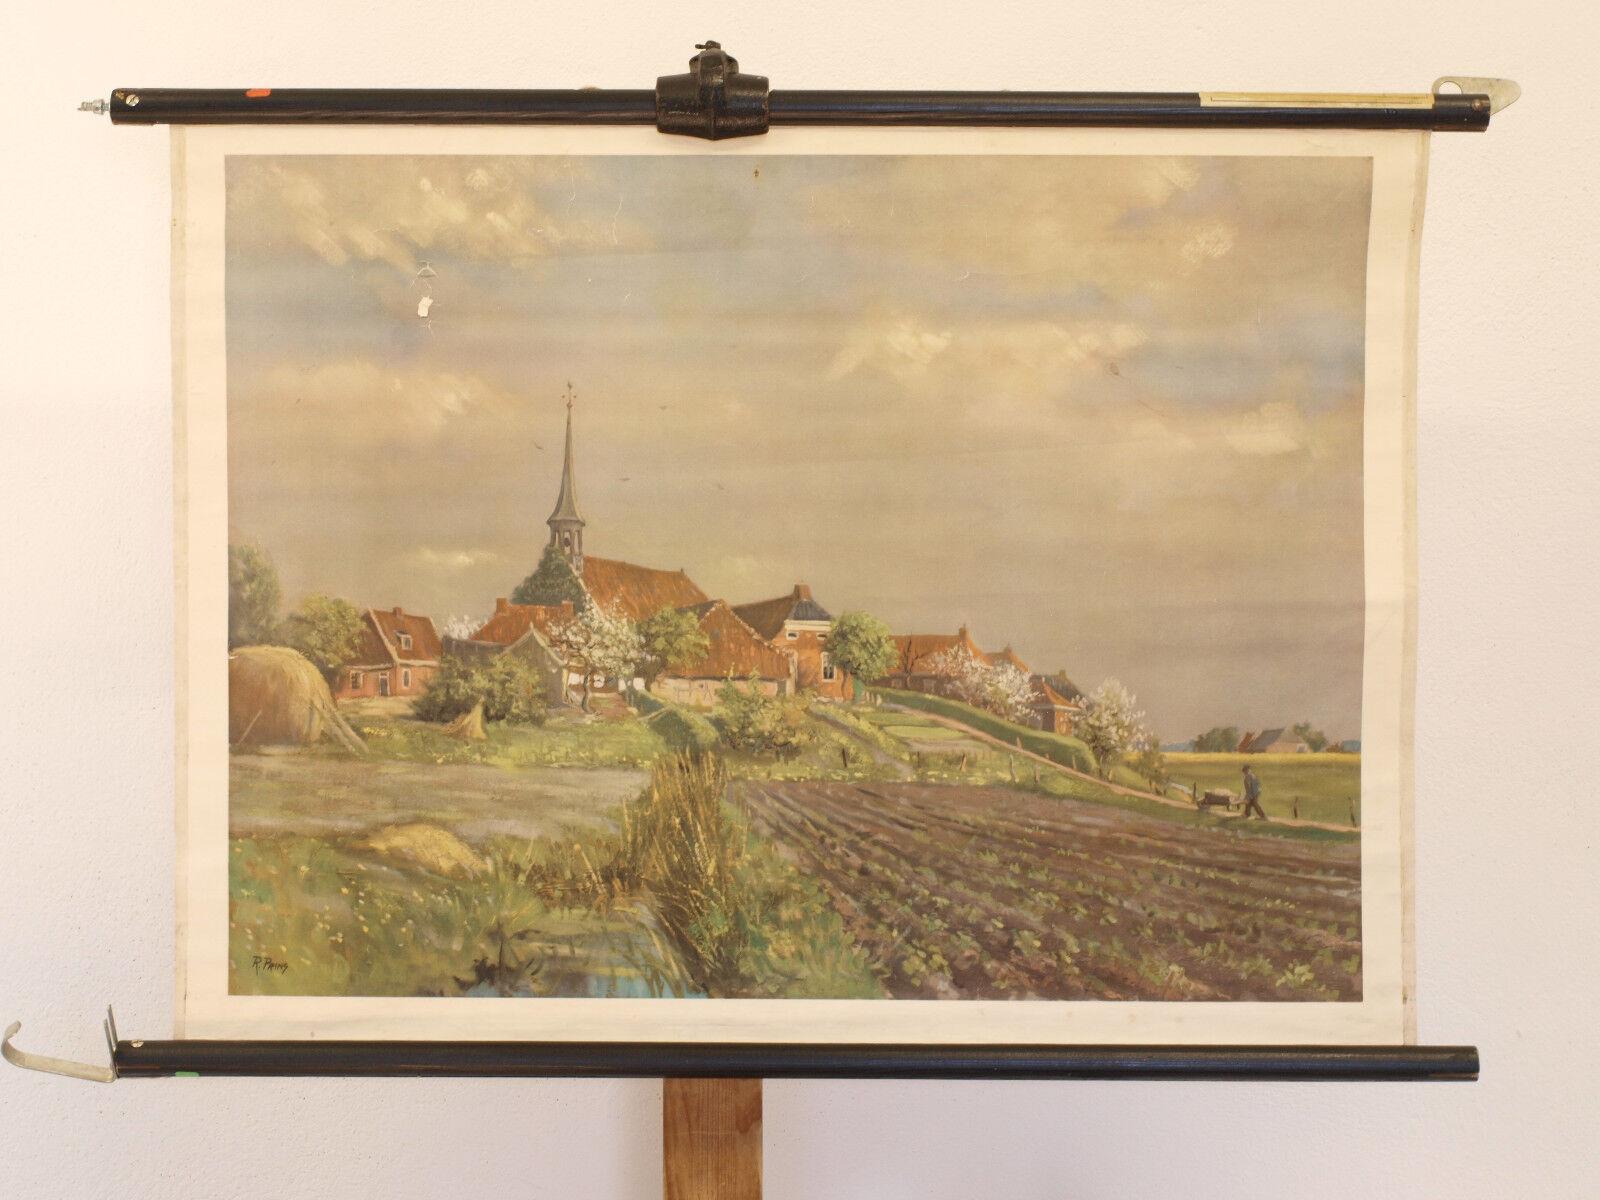 Warft an der Nordseeküste R.Prins Kirche Das Watt Wandbild 82x60cm vintage 1930